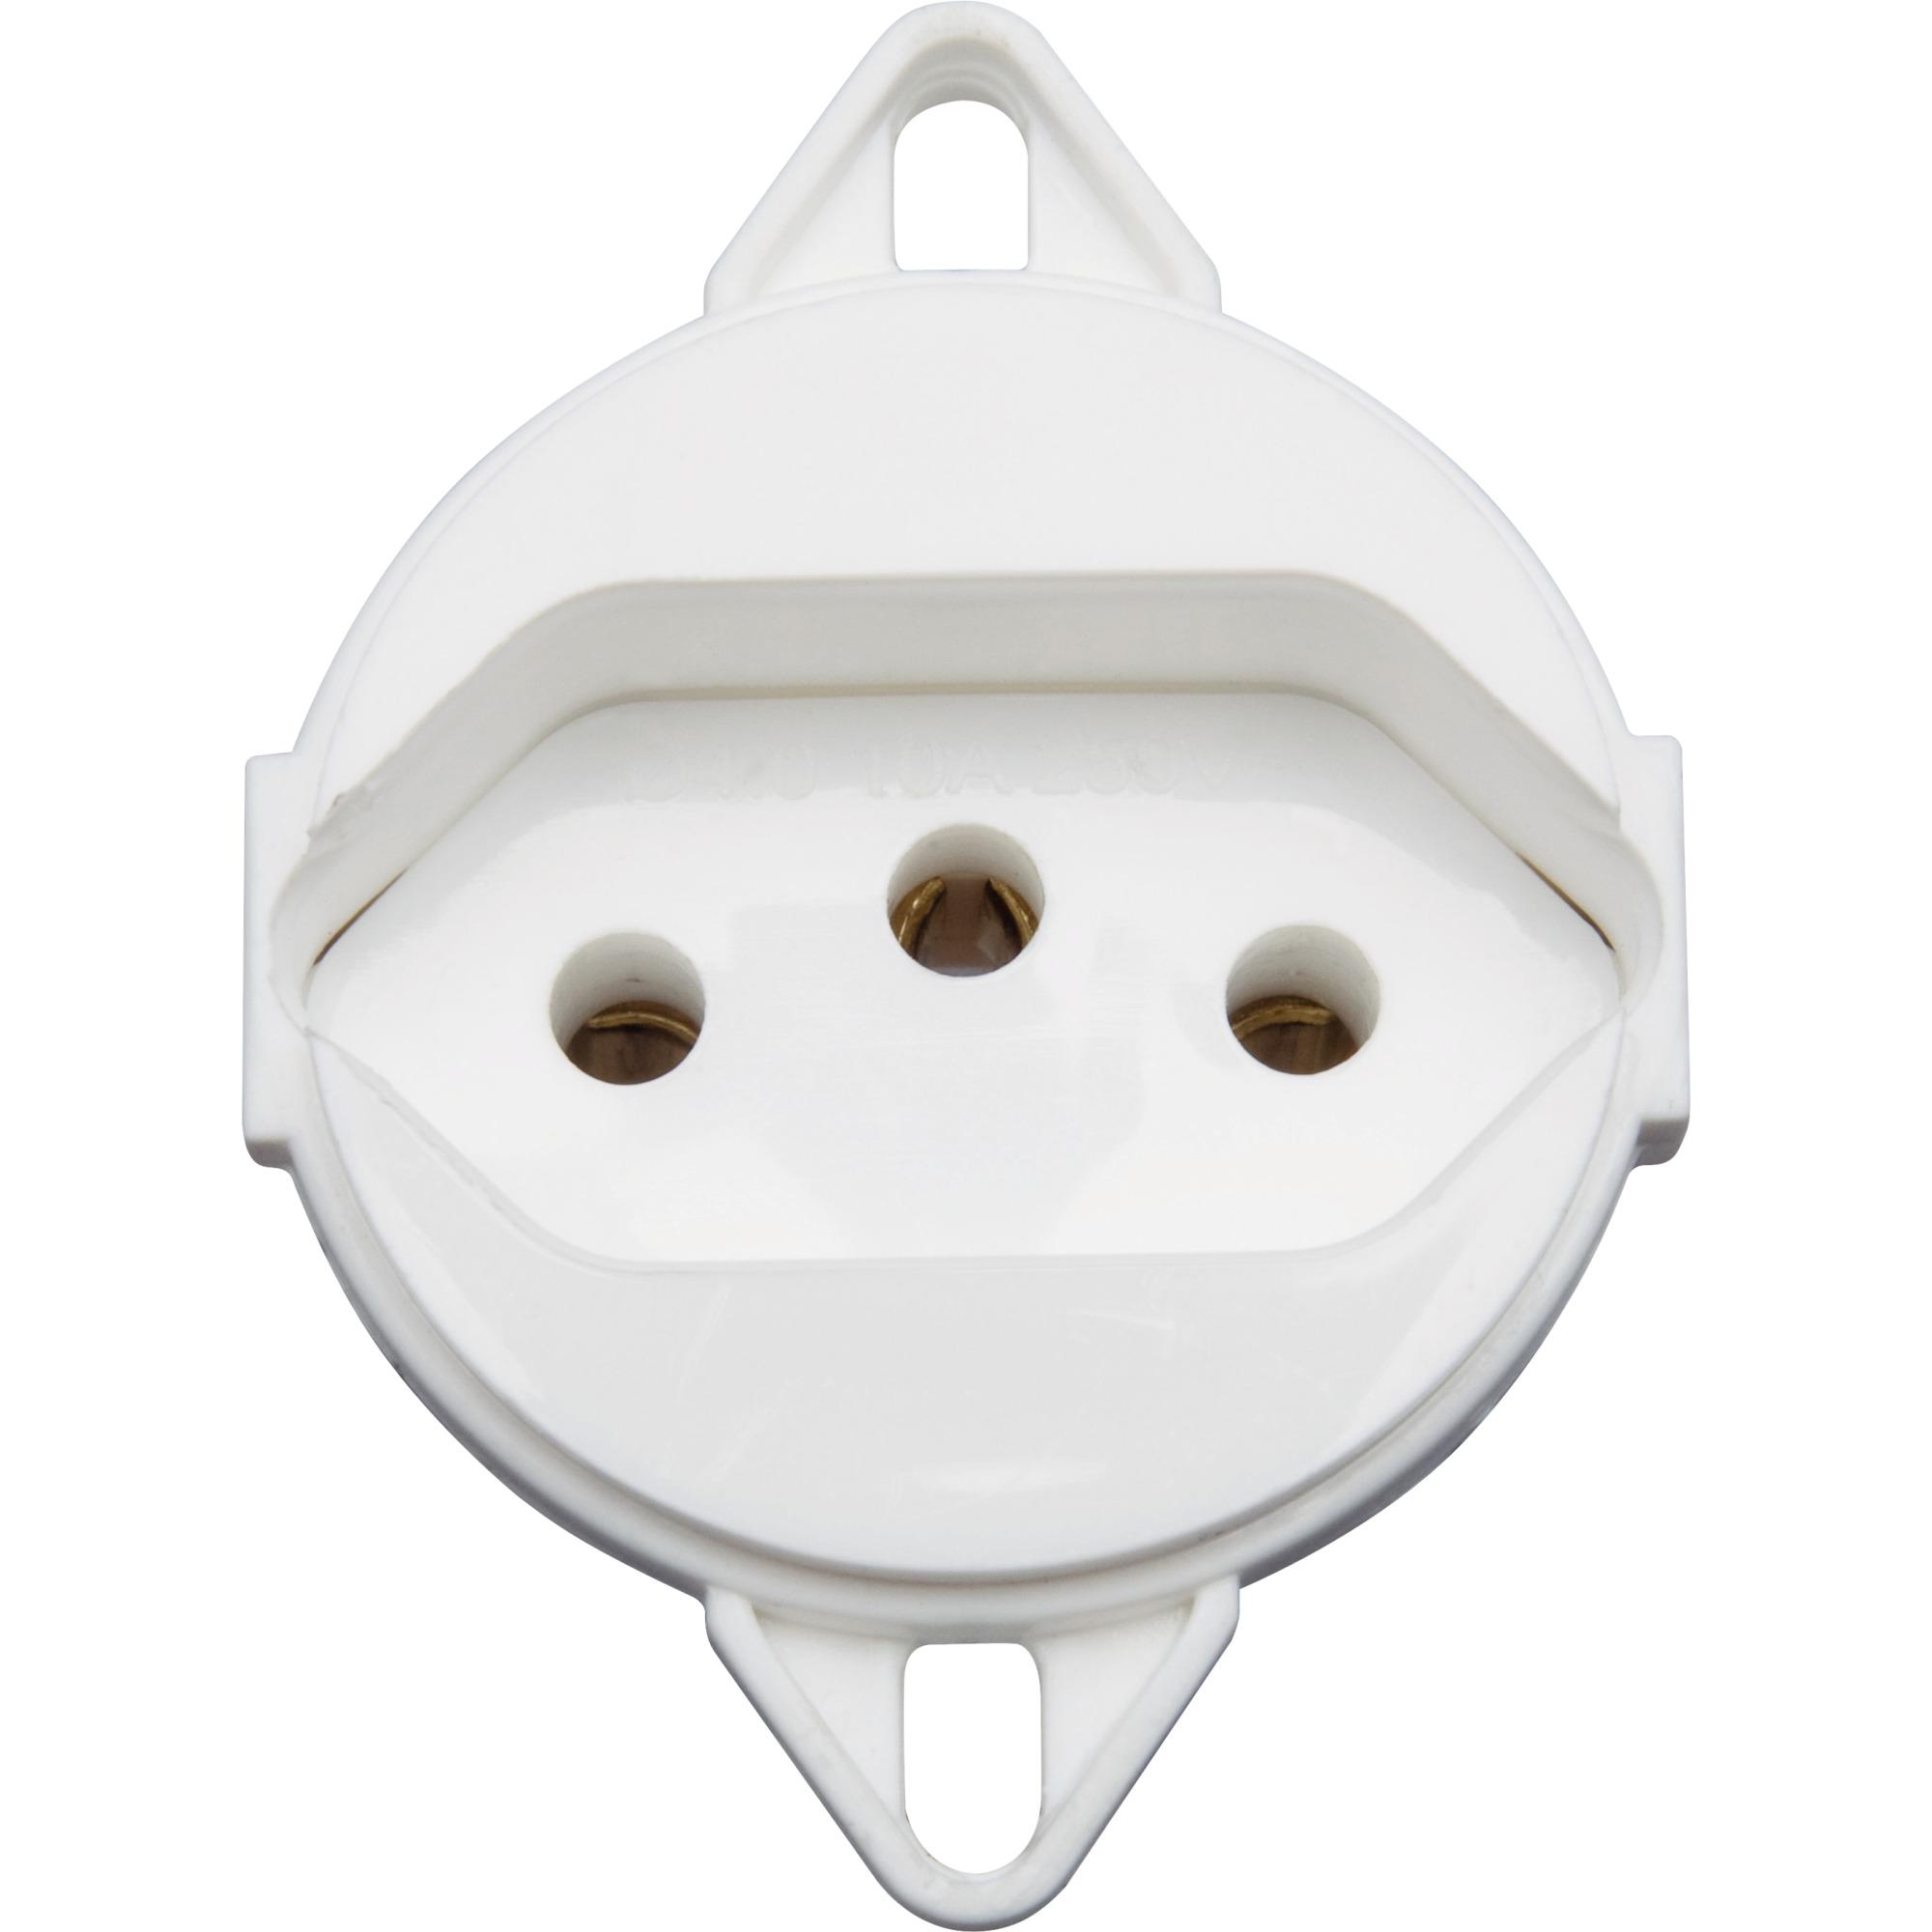 Modulo de Tomada de Energia 1 Modulo 2P T 10A Branco - Acessorios Para Eletrodutos - Tramontina